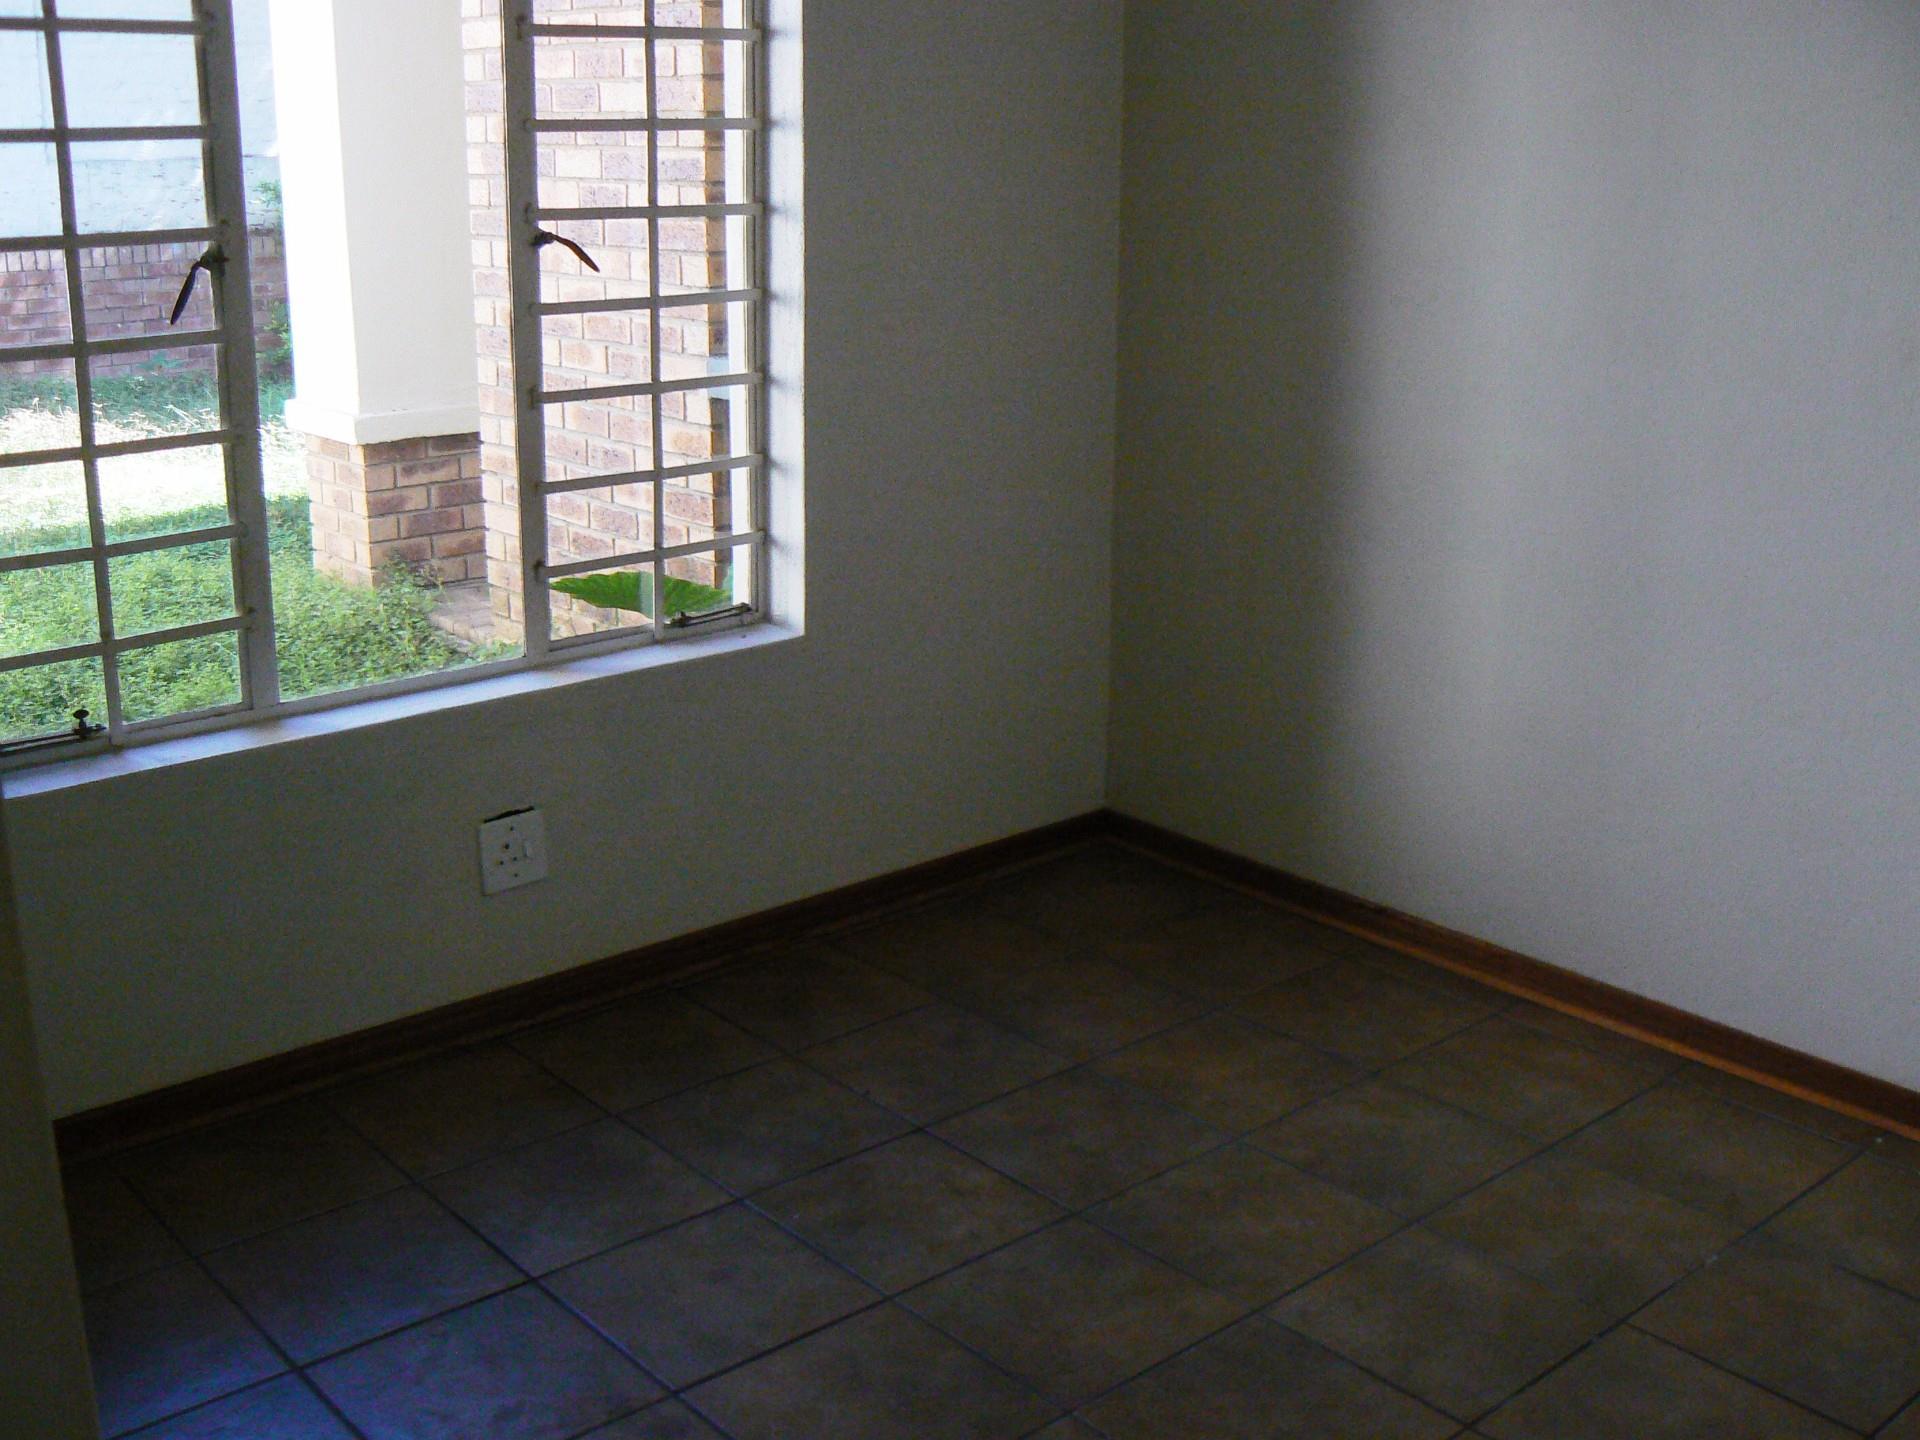 West Acres & Ext property for sale. Ref No: 13485783. Picture no 5